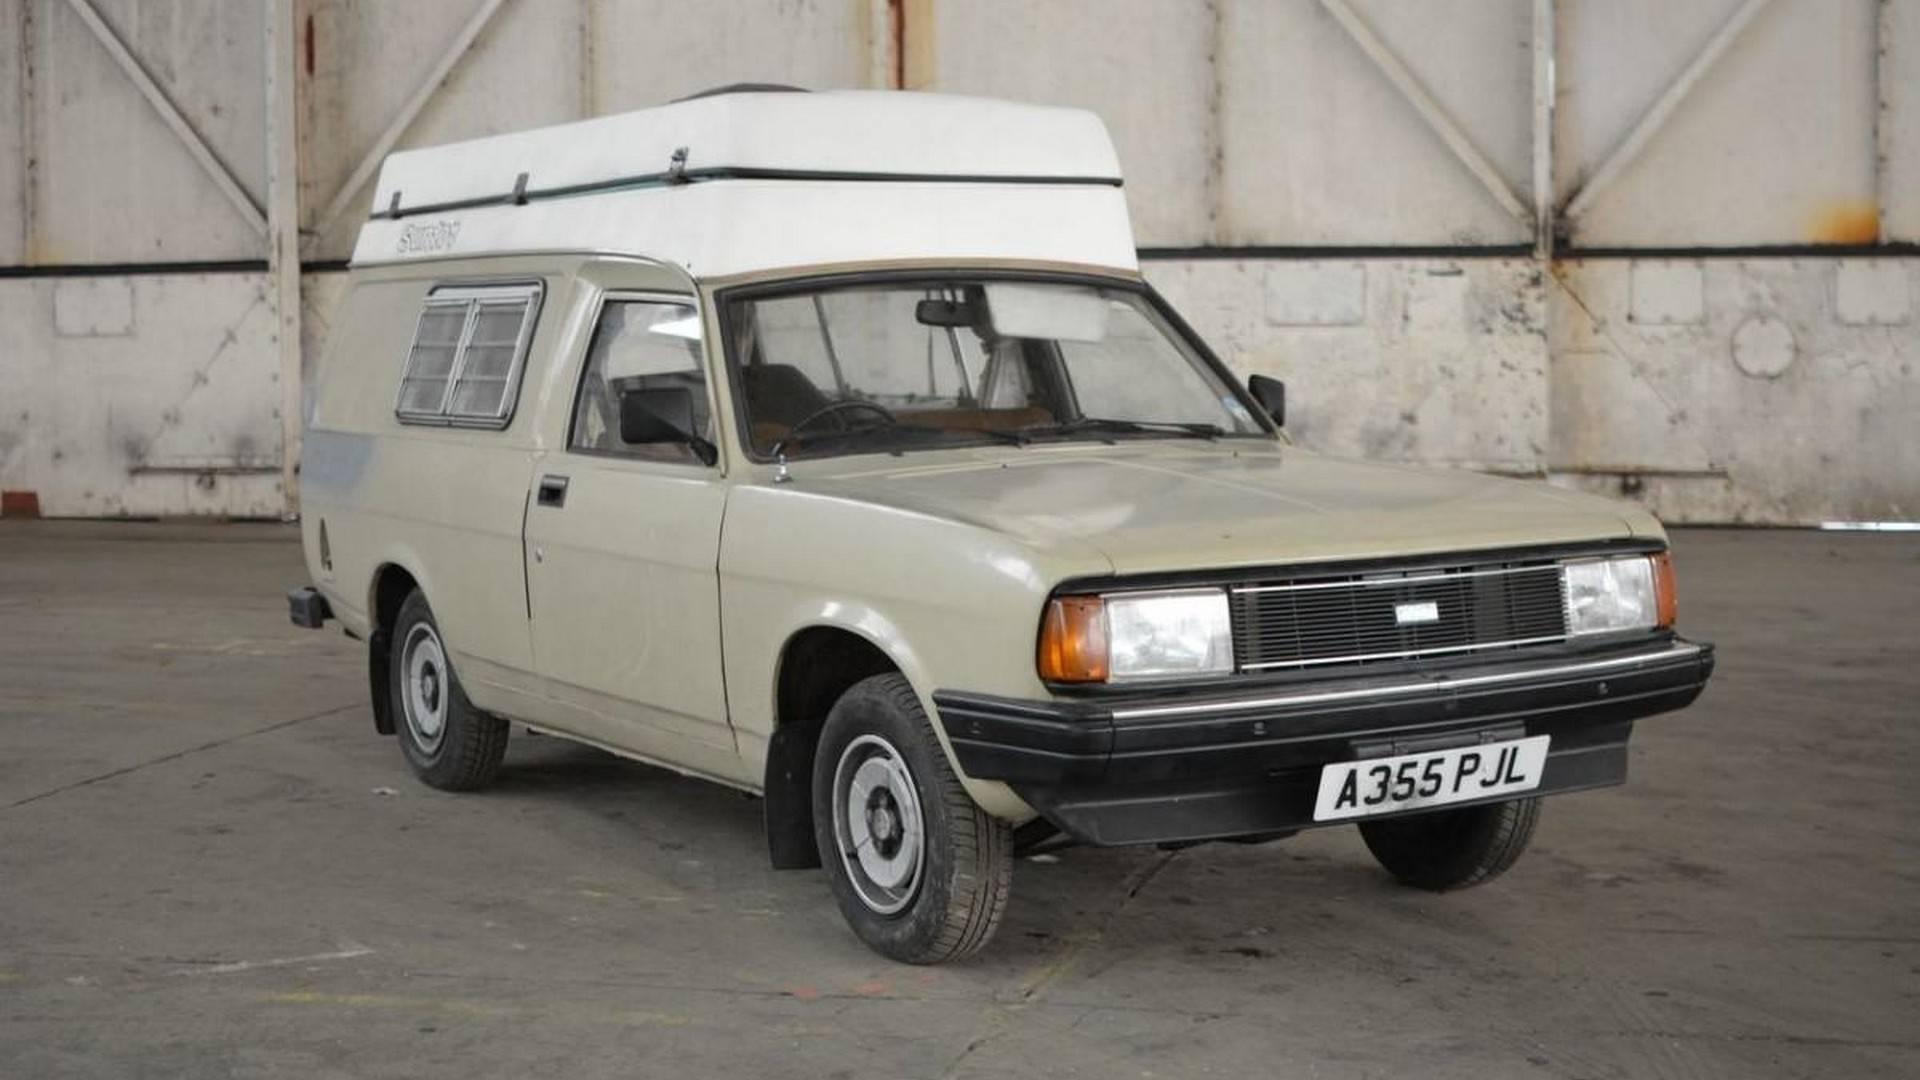 Amazing Affordable Classics Inspiration - Classic Cars Ideas - boiq.info